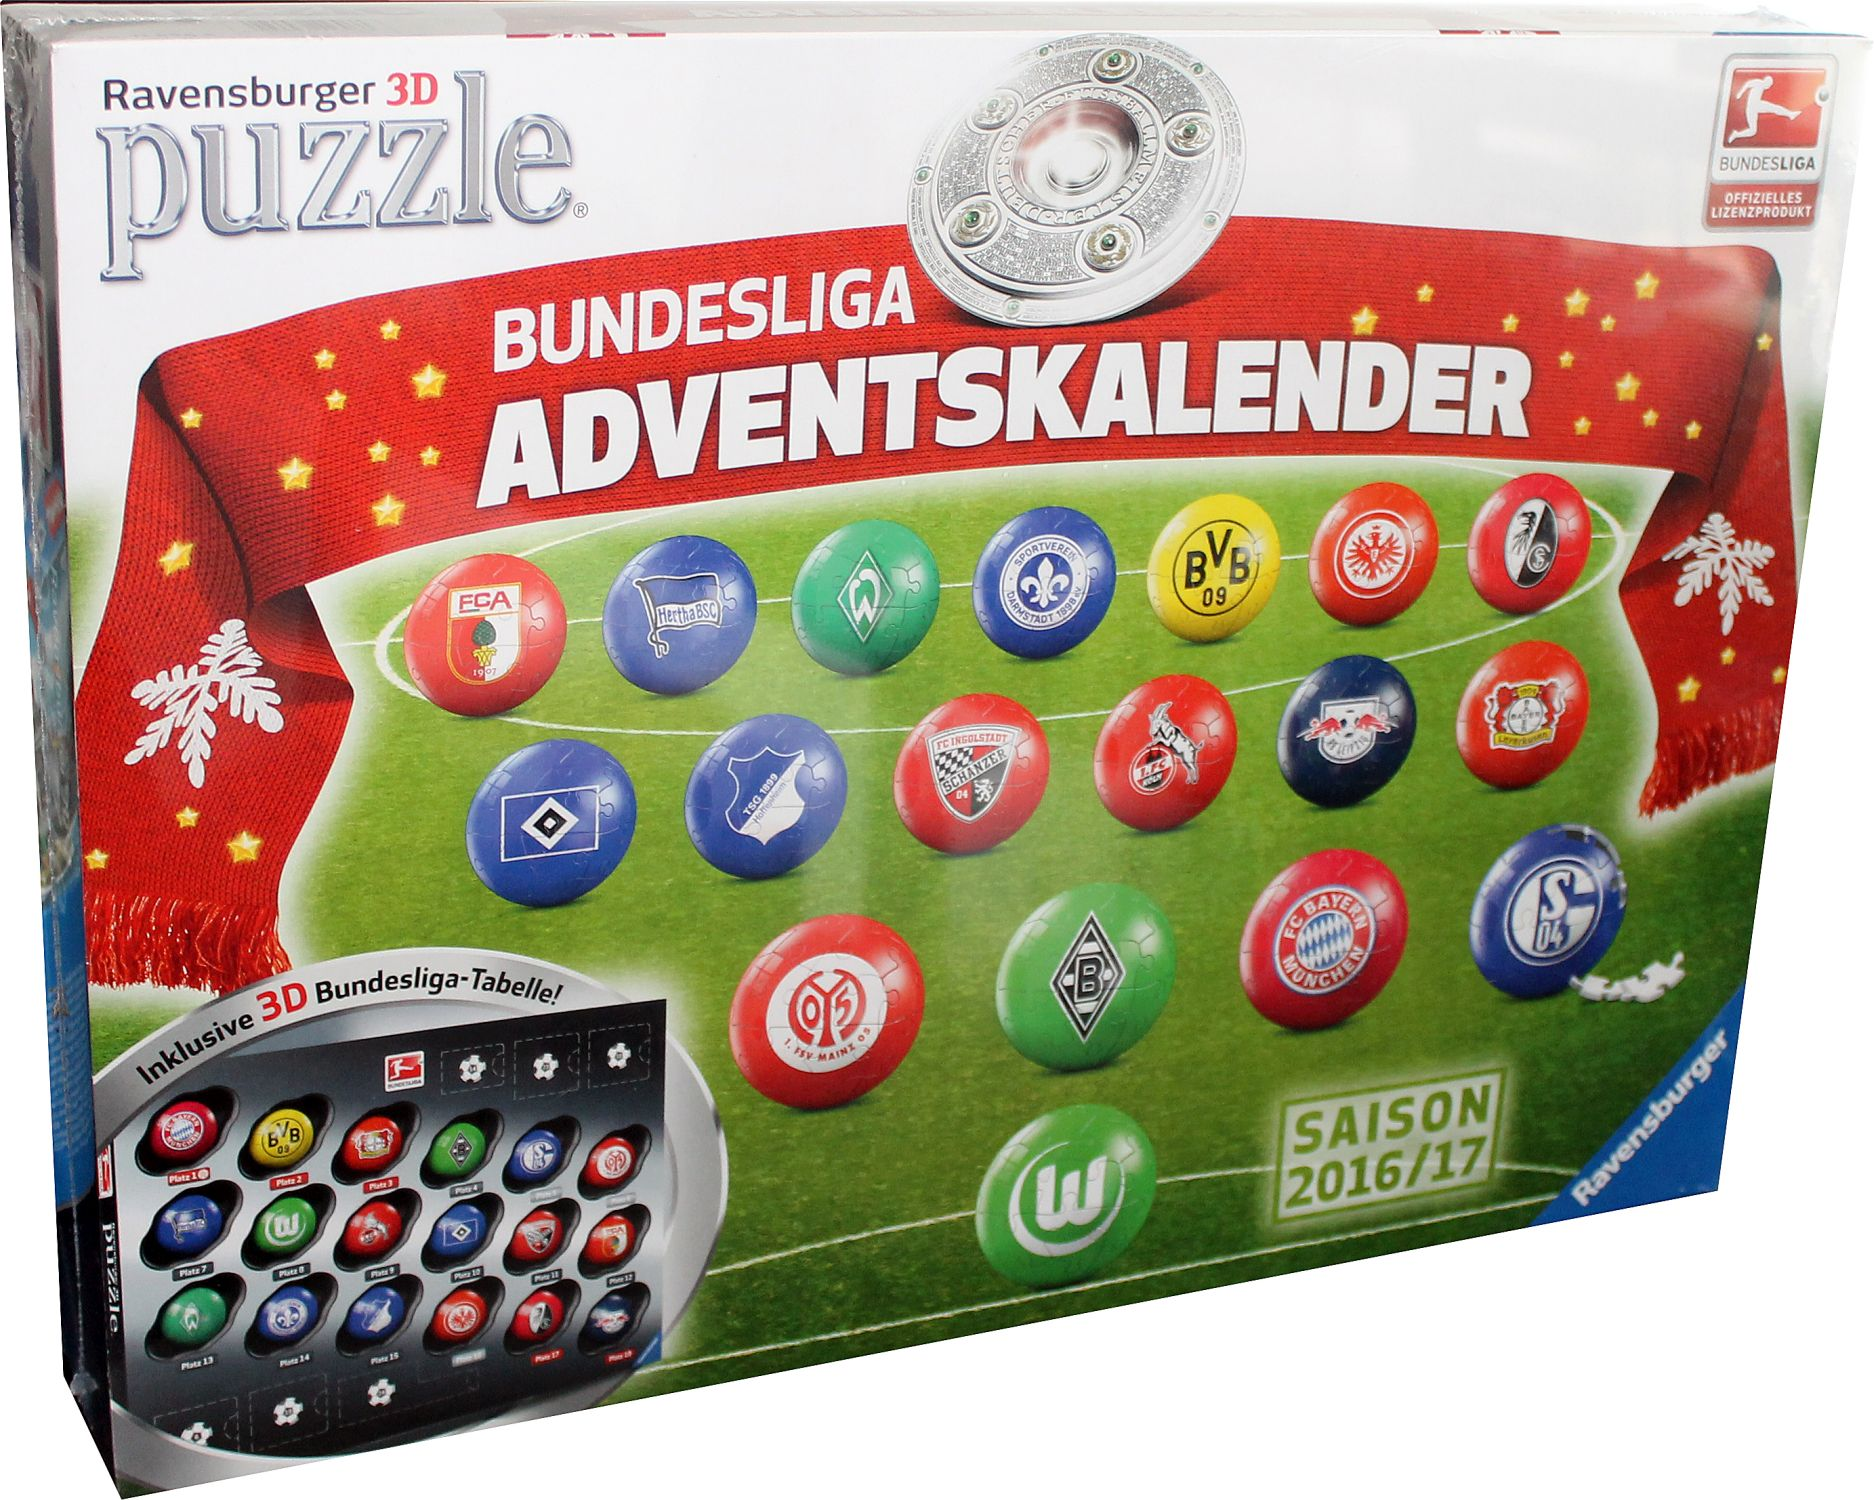 Ravensburger Adventskalender 3d Puzzle Fussball Bundesliga 2016 2017 Neu